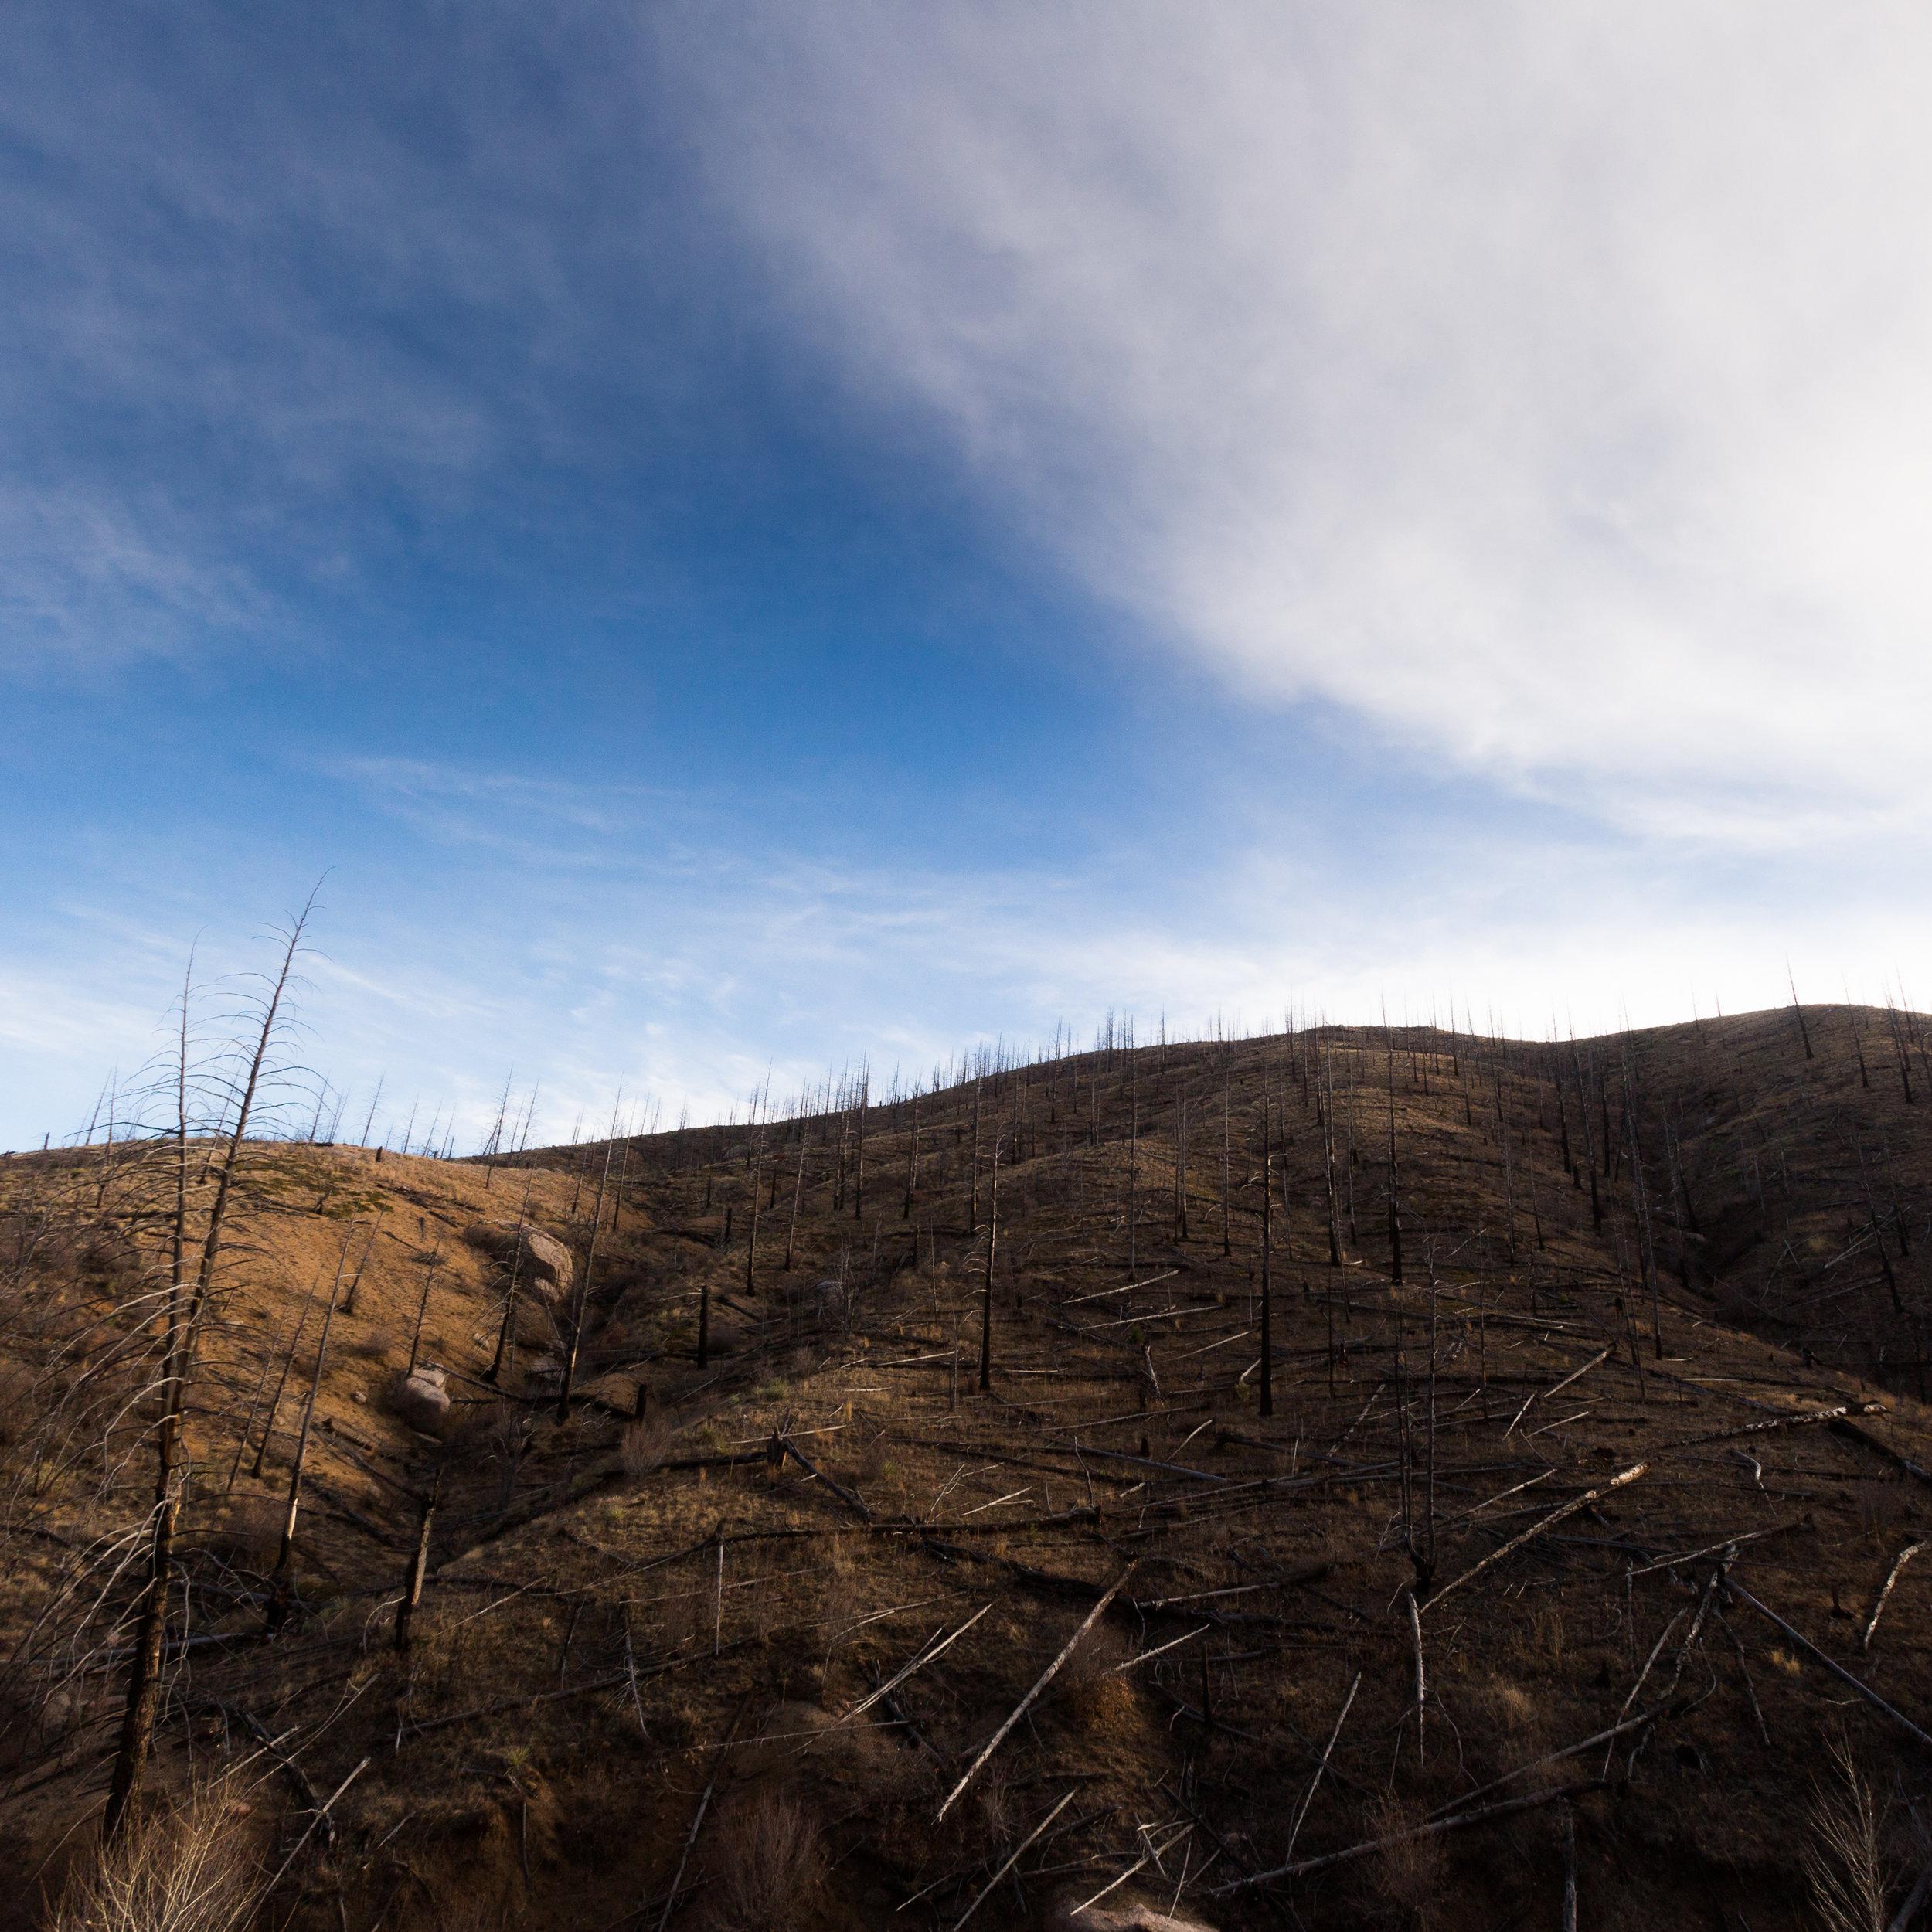 Pike_National_Forest_Fire-4119.jpg